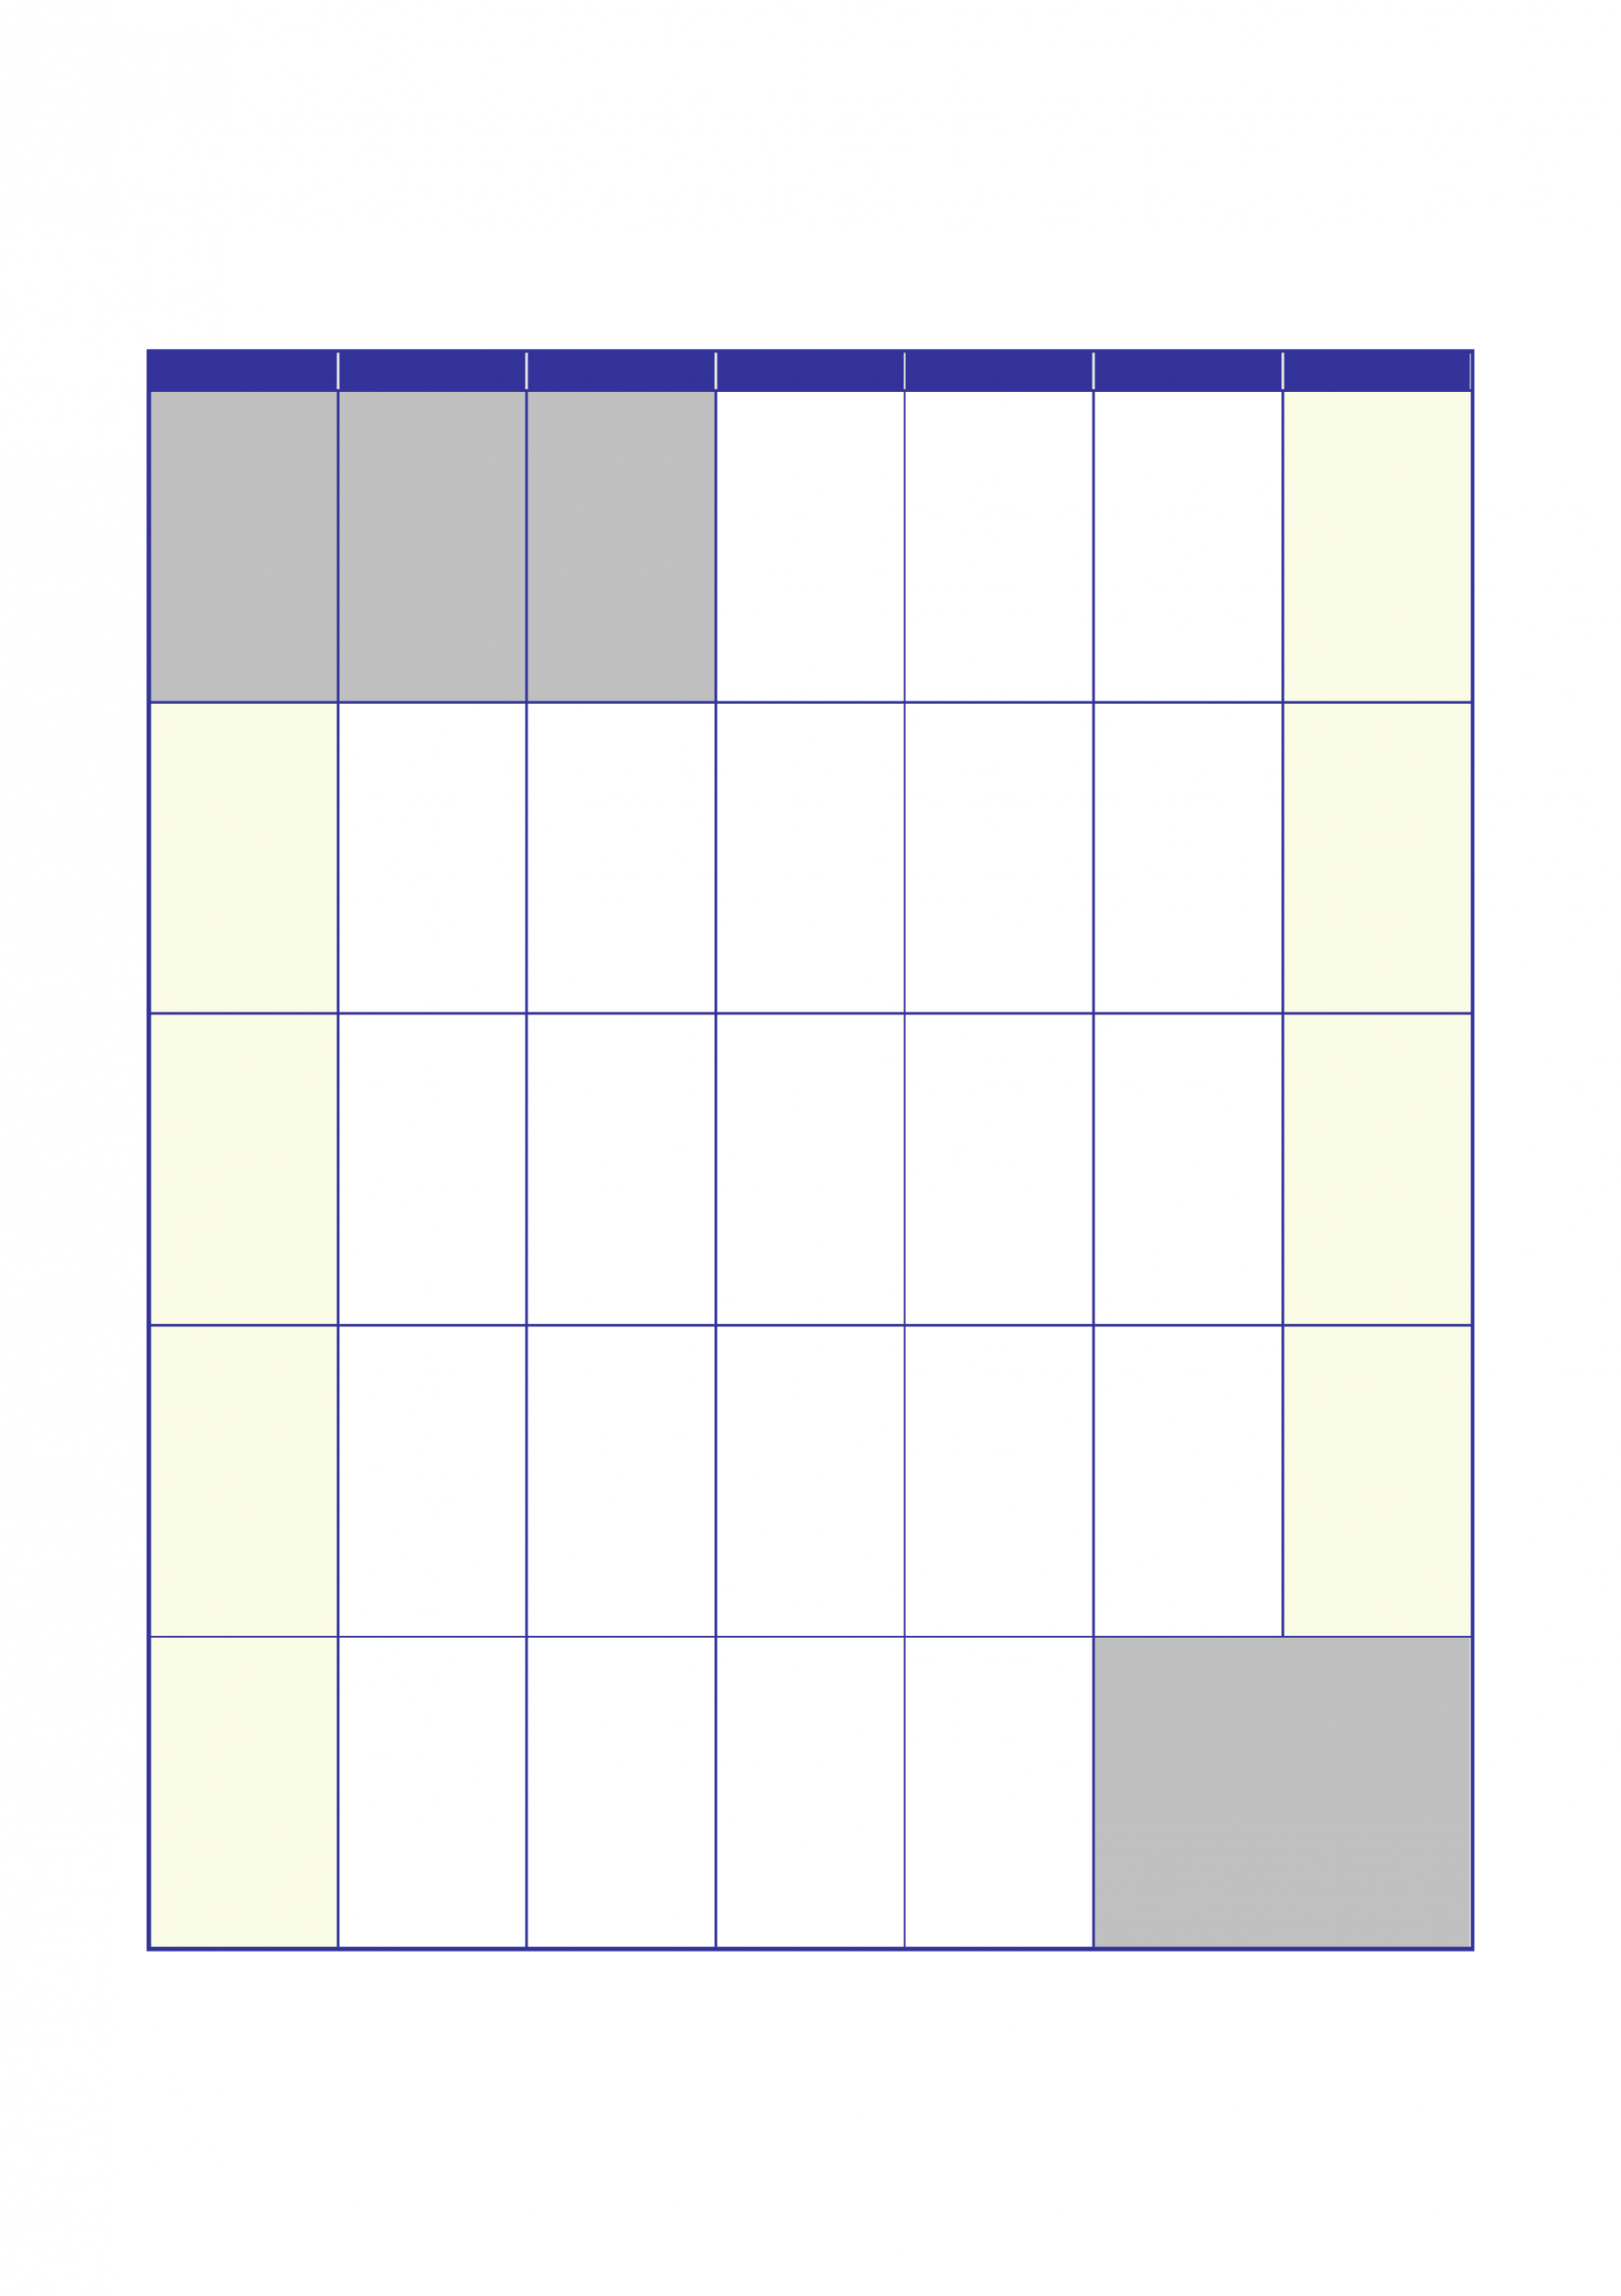 June 2016 Us Calendar With Holidays - Edit, Fill, Sign How To Fill June Calendar